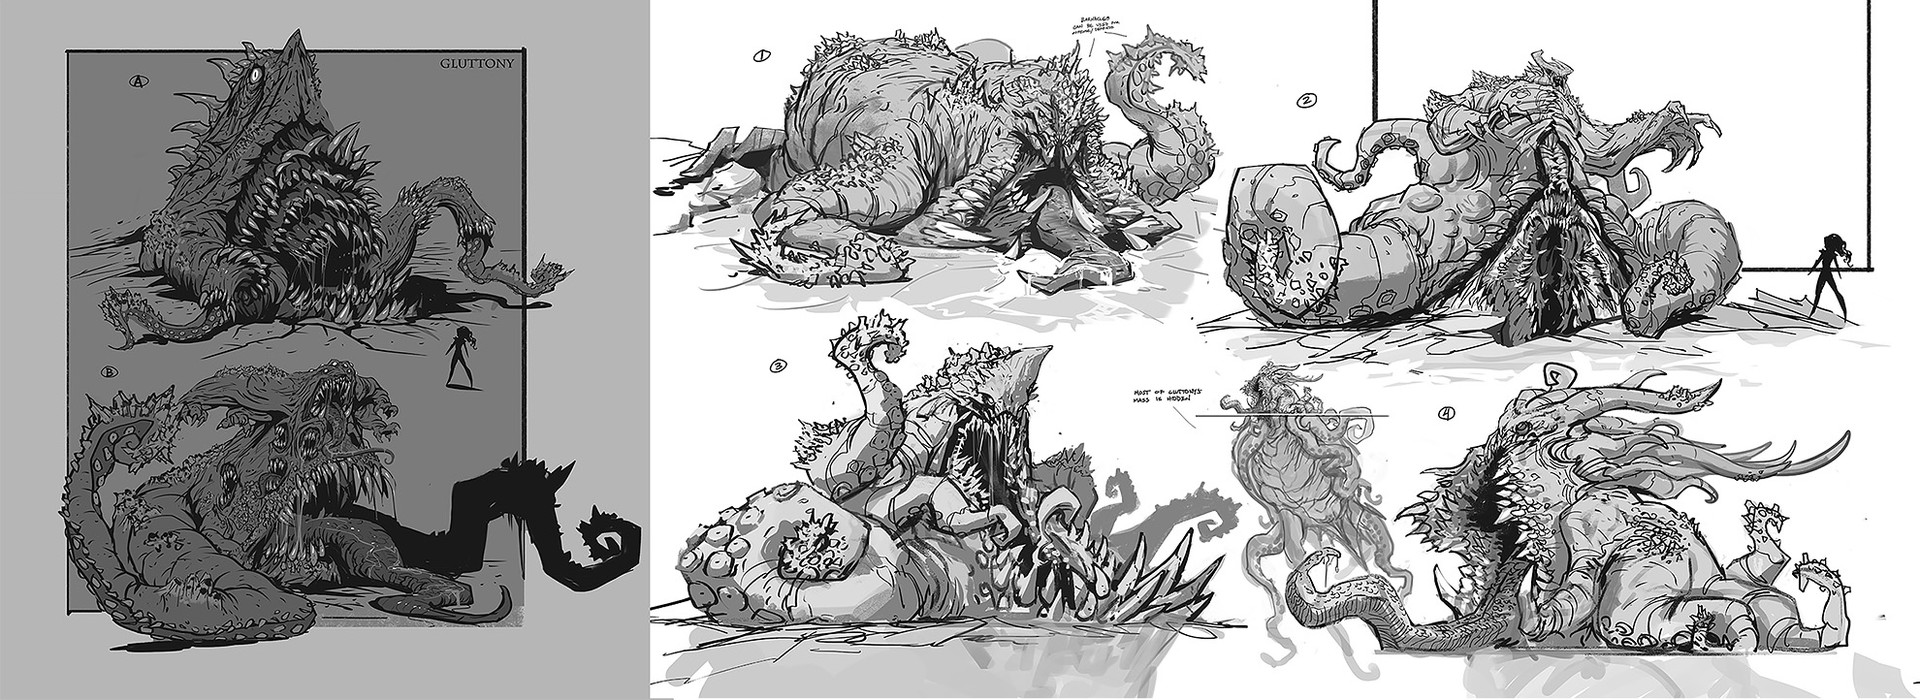 Daryl mandryk gluttony sketches